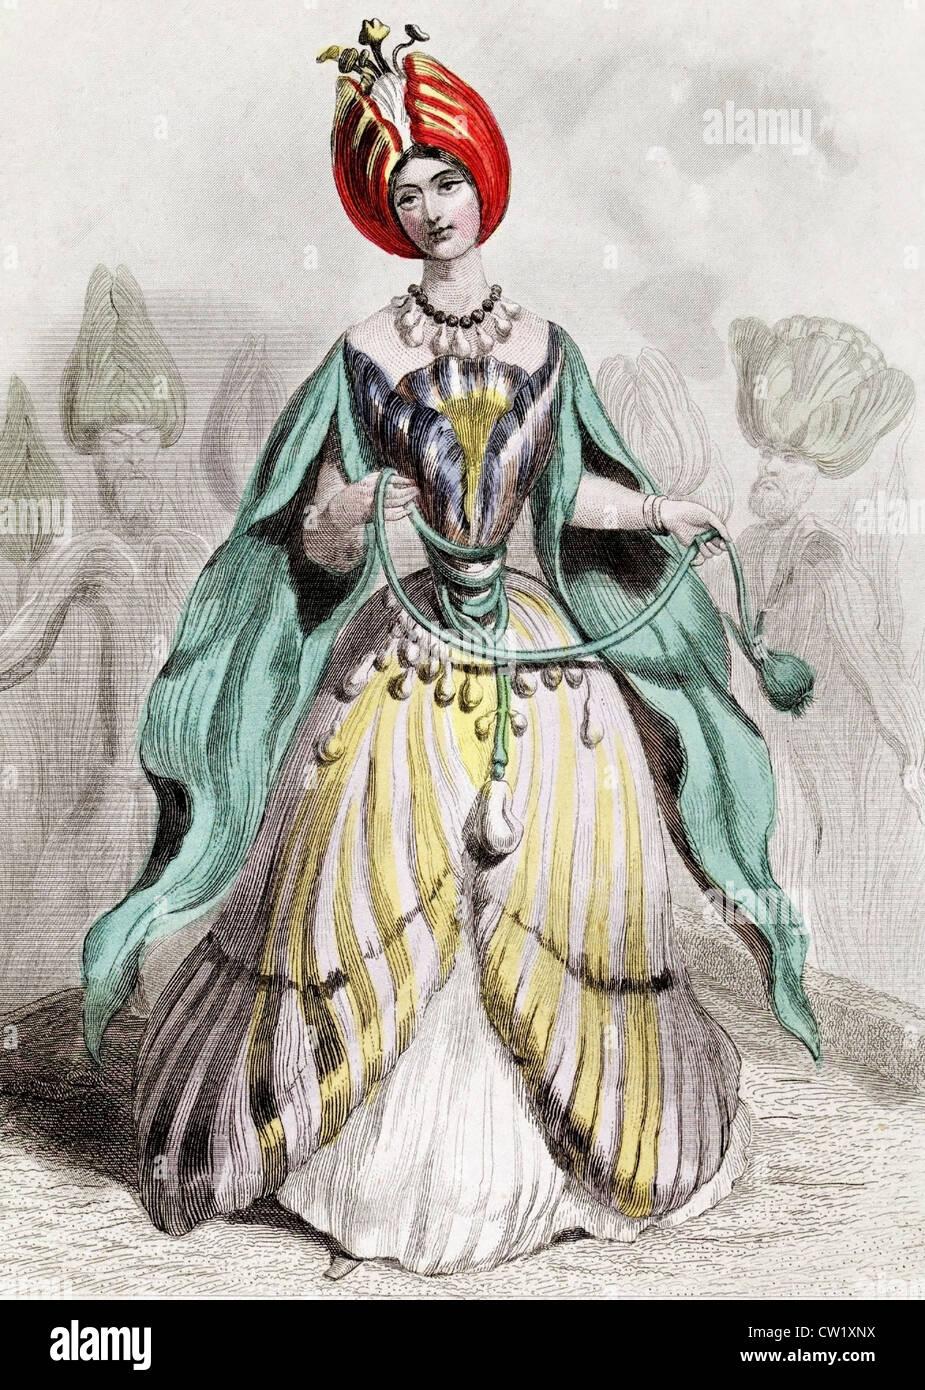 Tulip detail - Stock Image